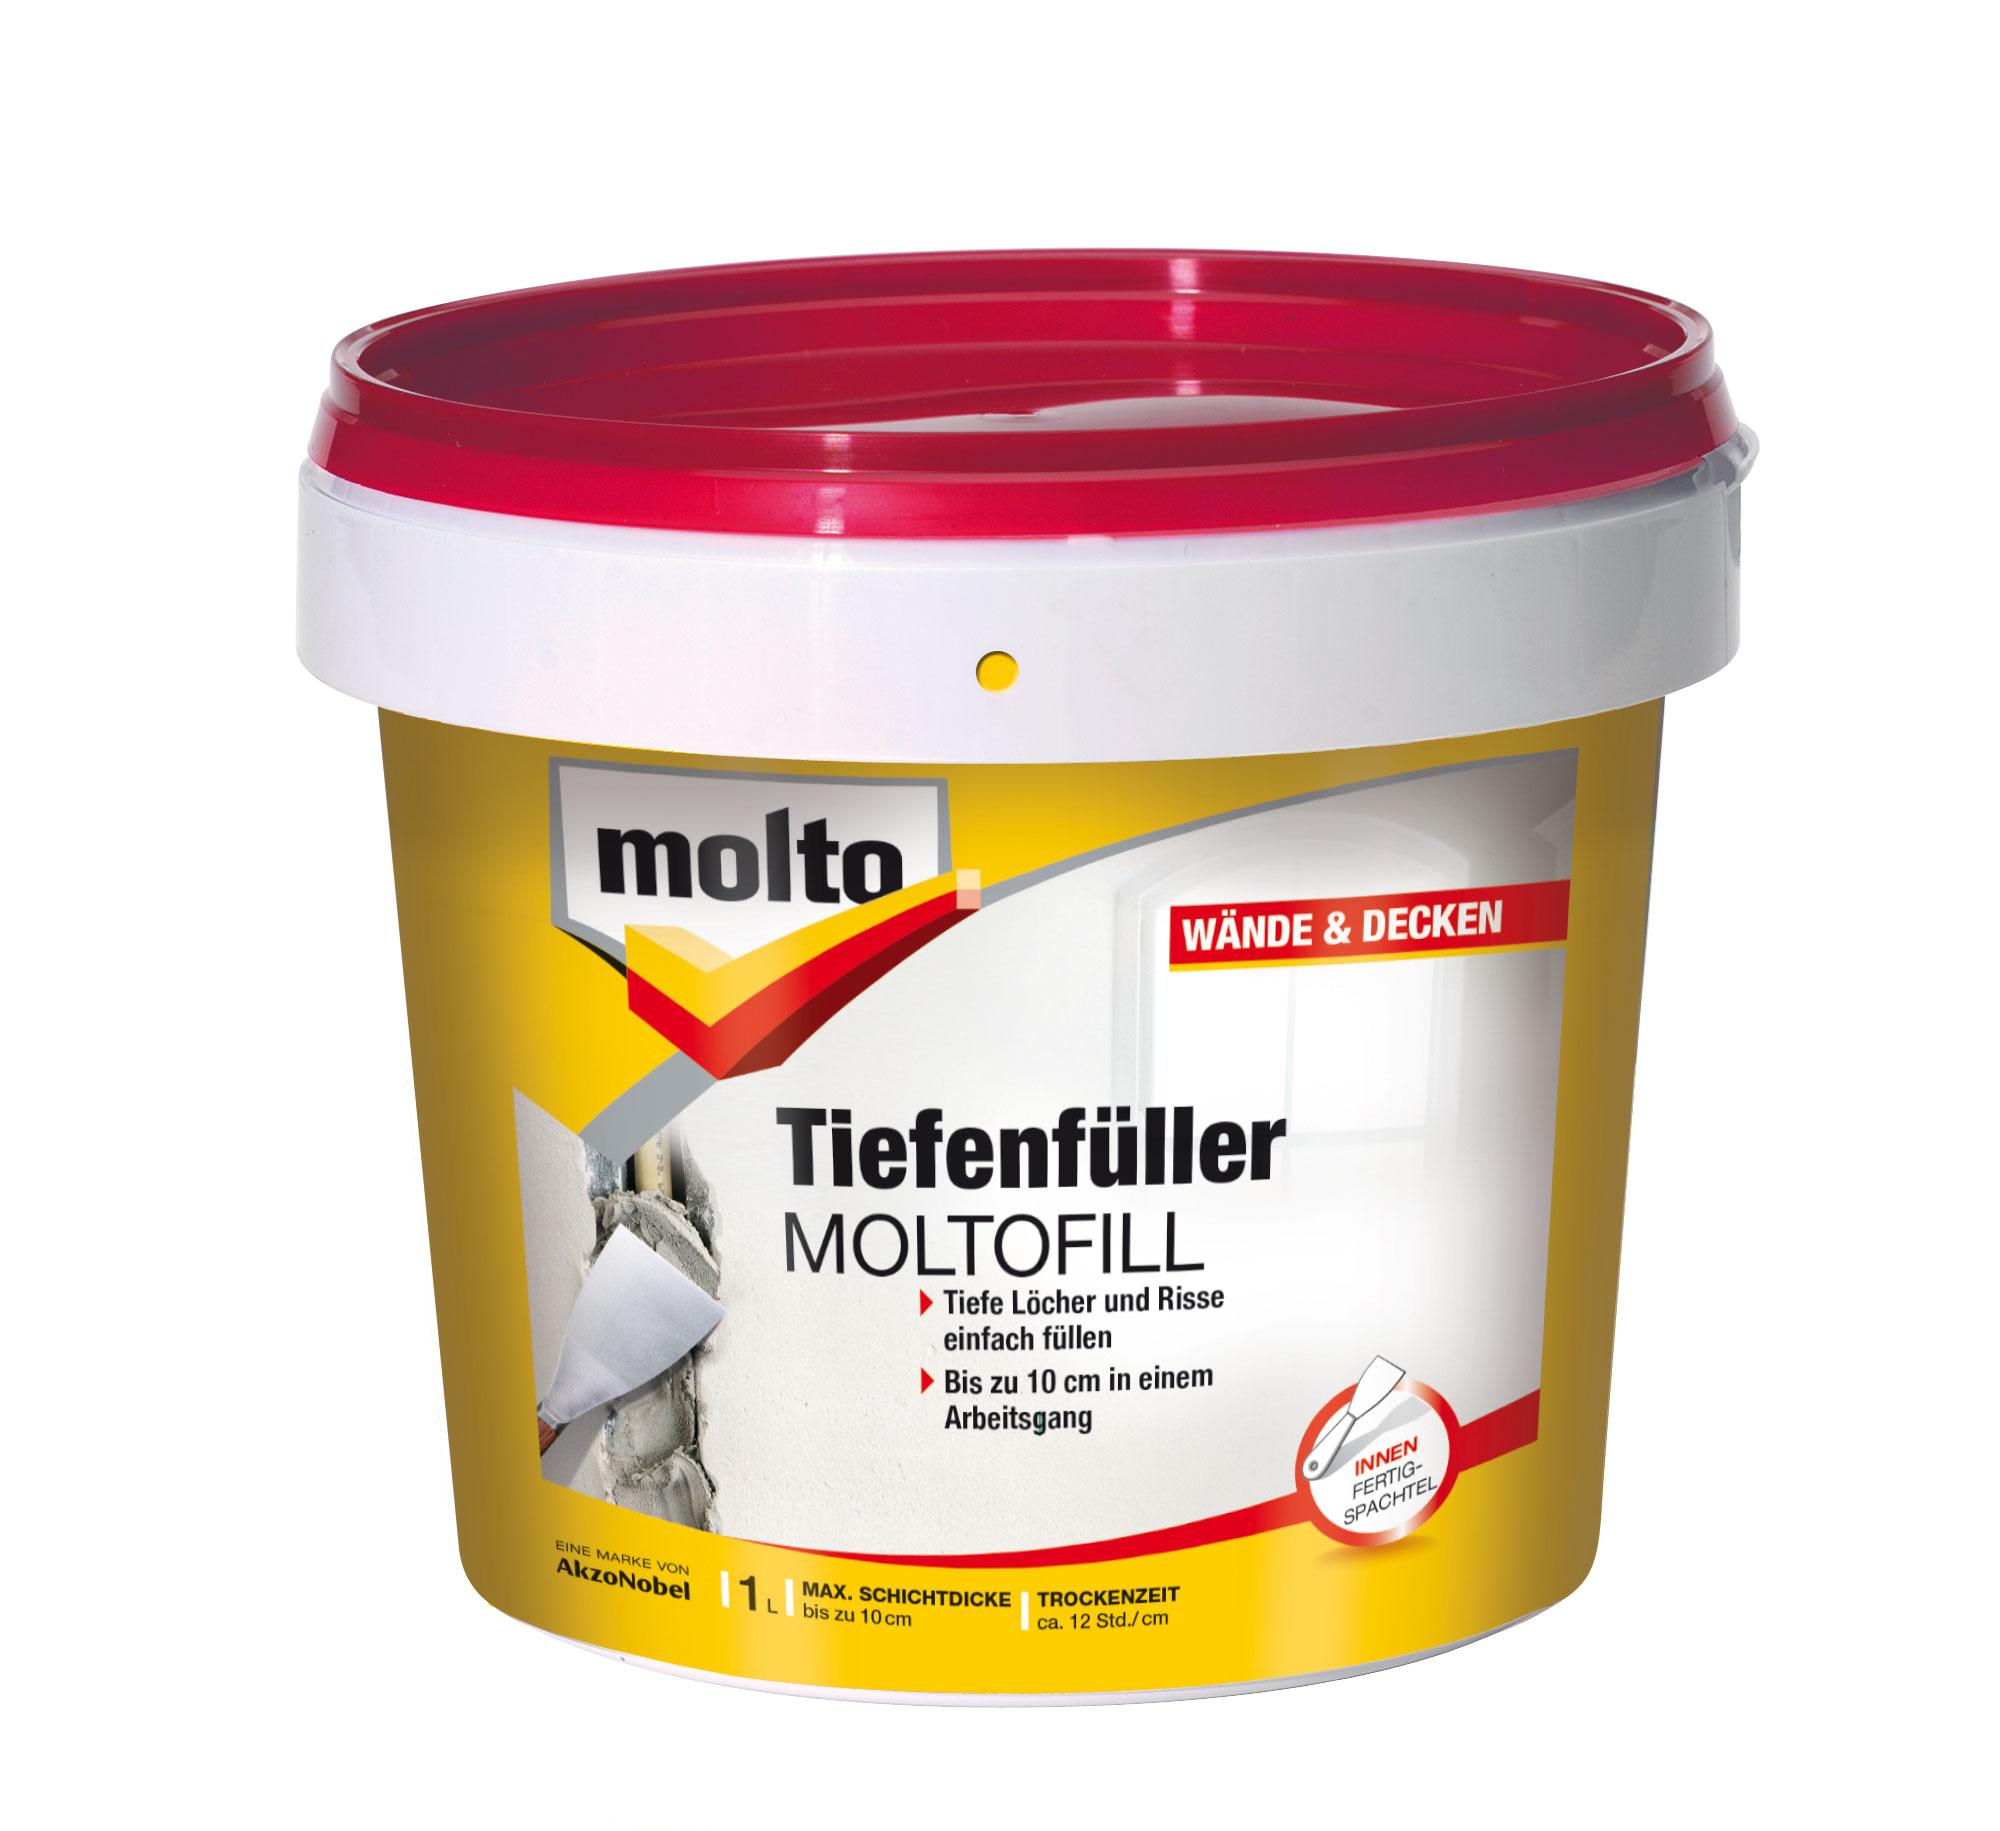 Molto Tiefenfüller Moltofill 1 Liter Bild 1